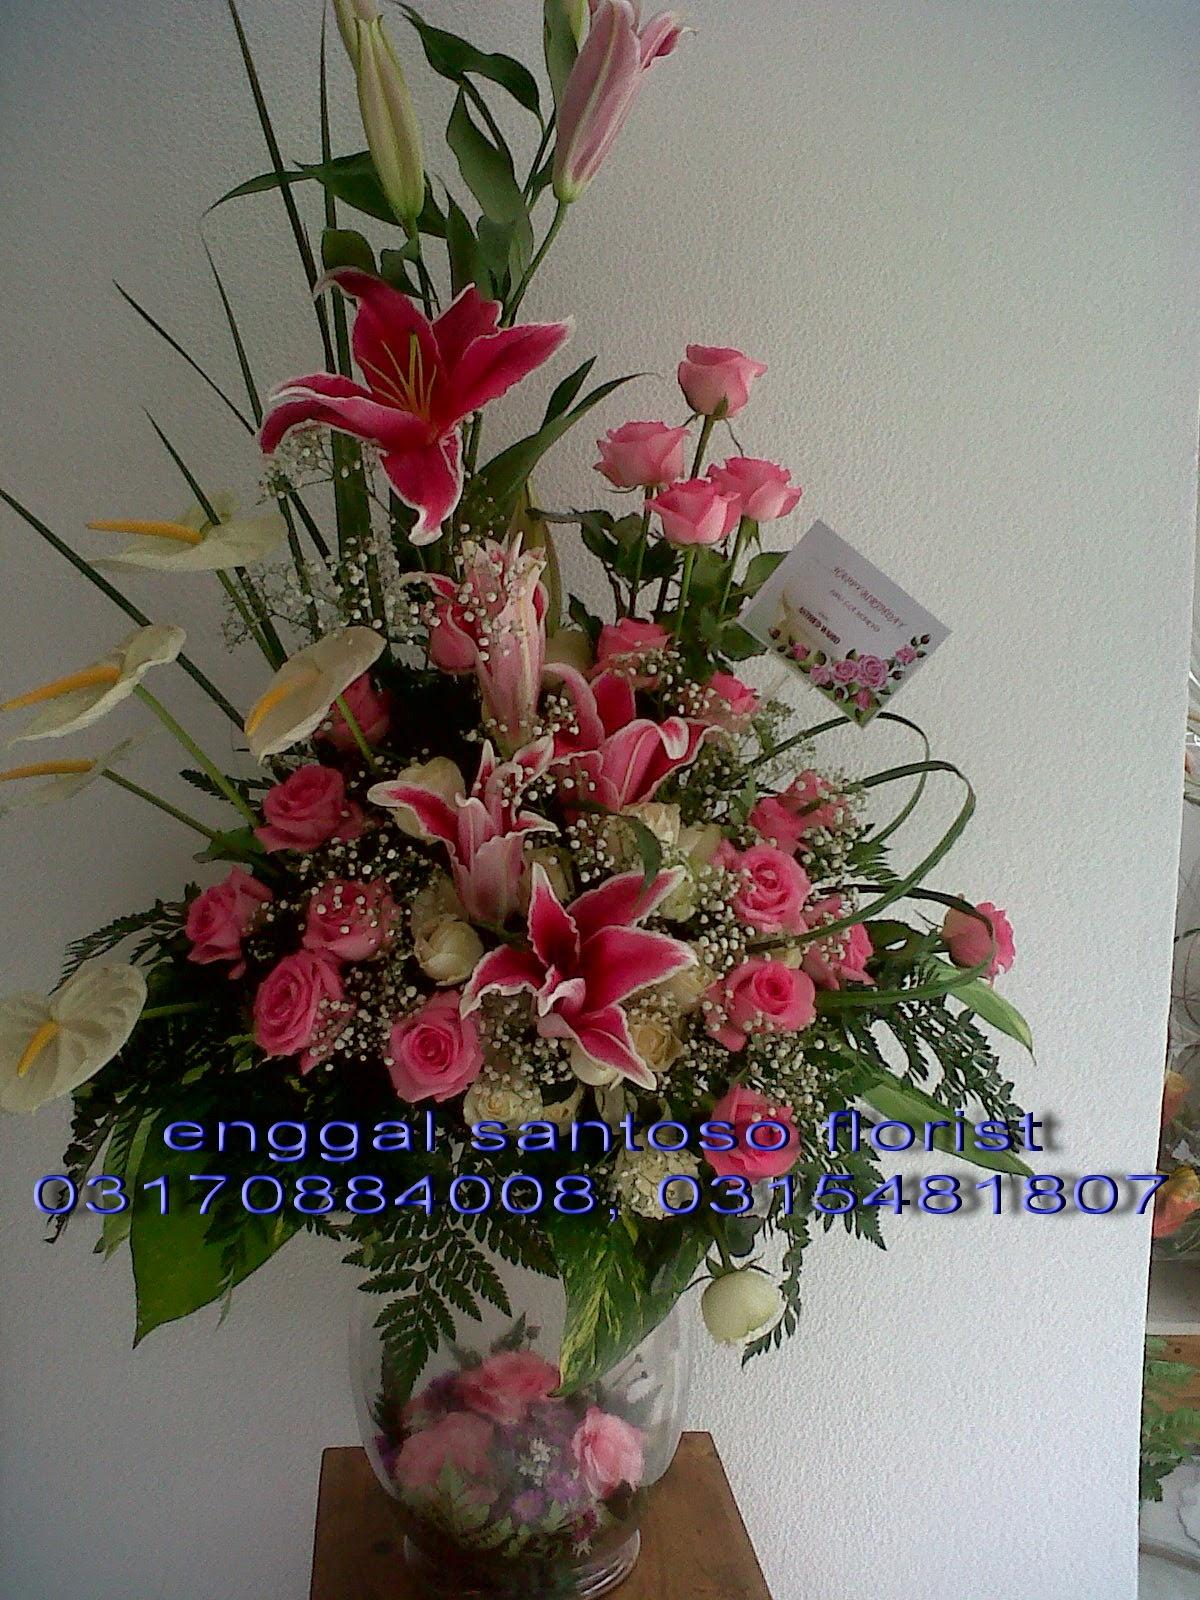 rangkaian karangan bunga meja mawar holland pink